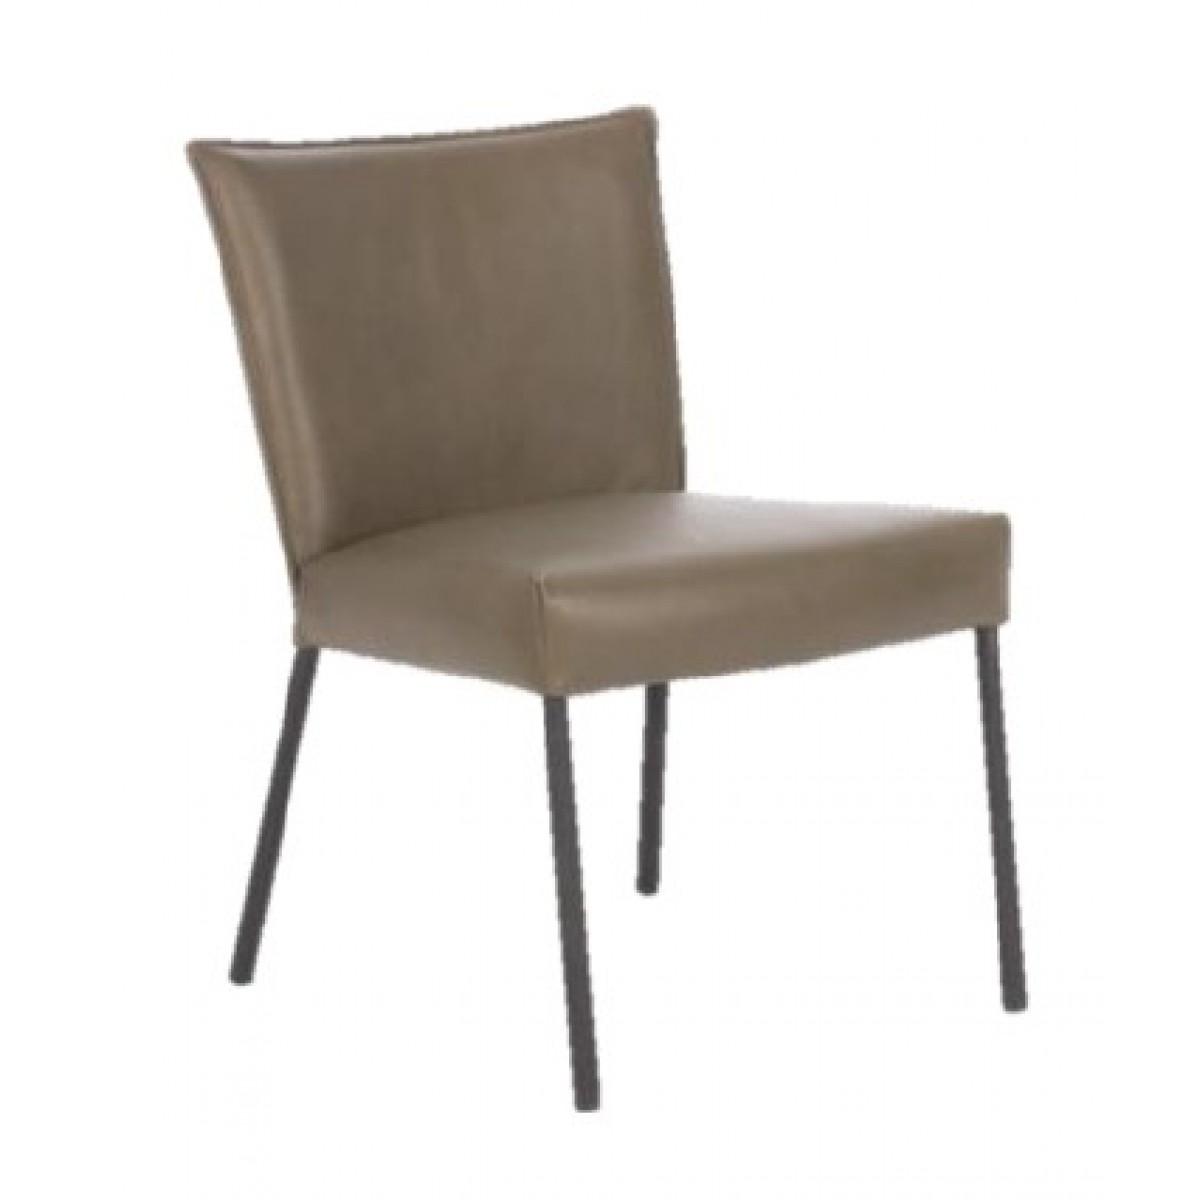 fortuna-eetkamerstoel-stoel-zonder-armleuning